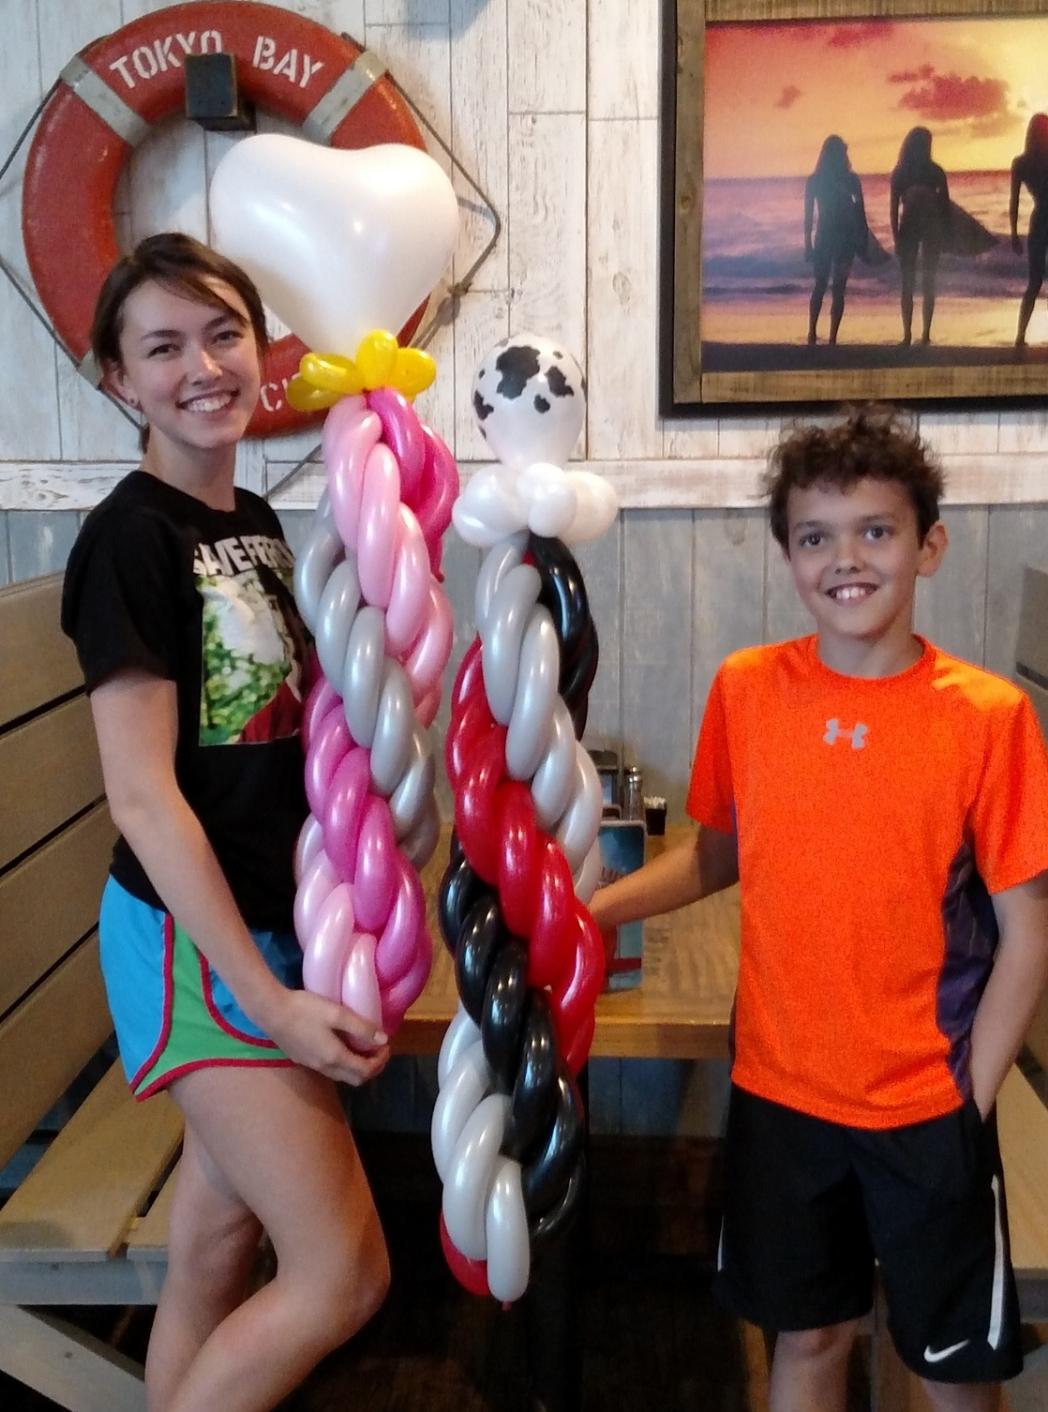 woven-balloons.jpg